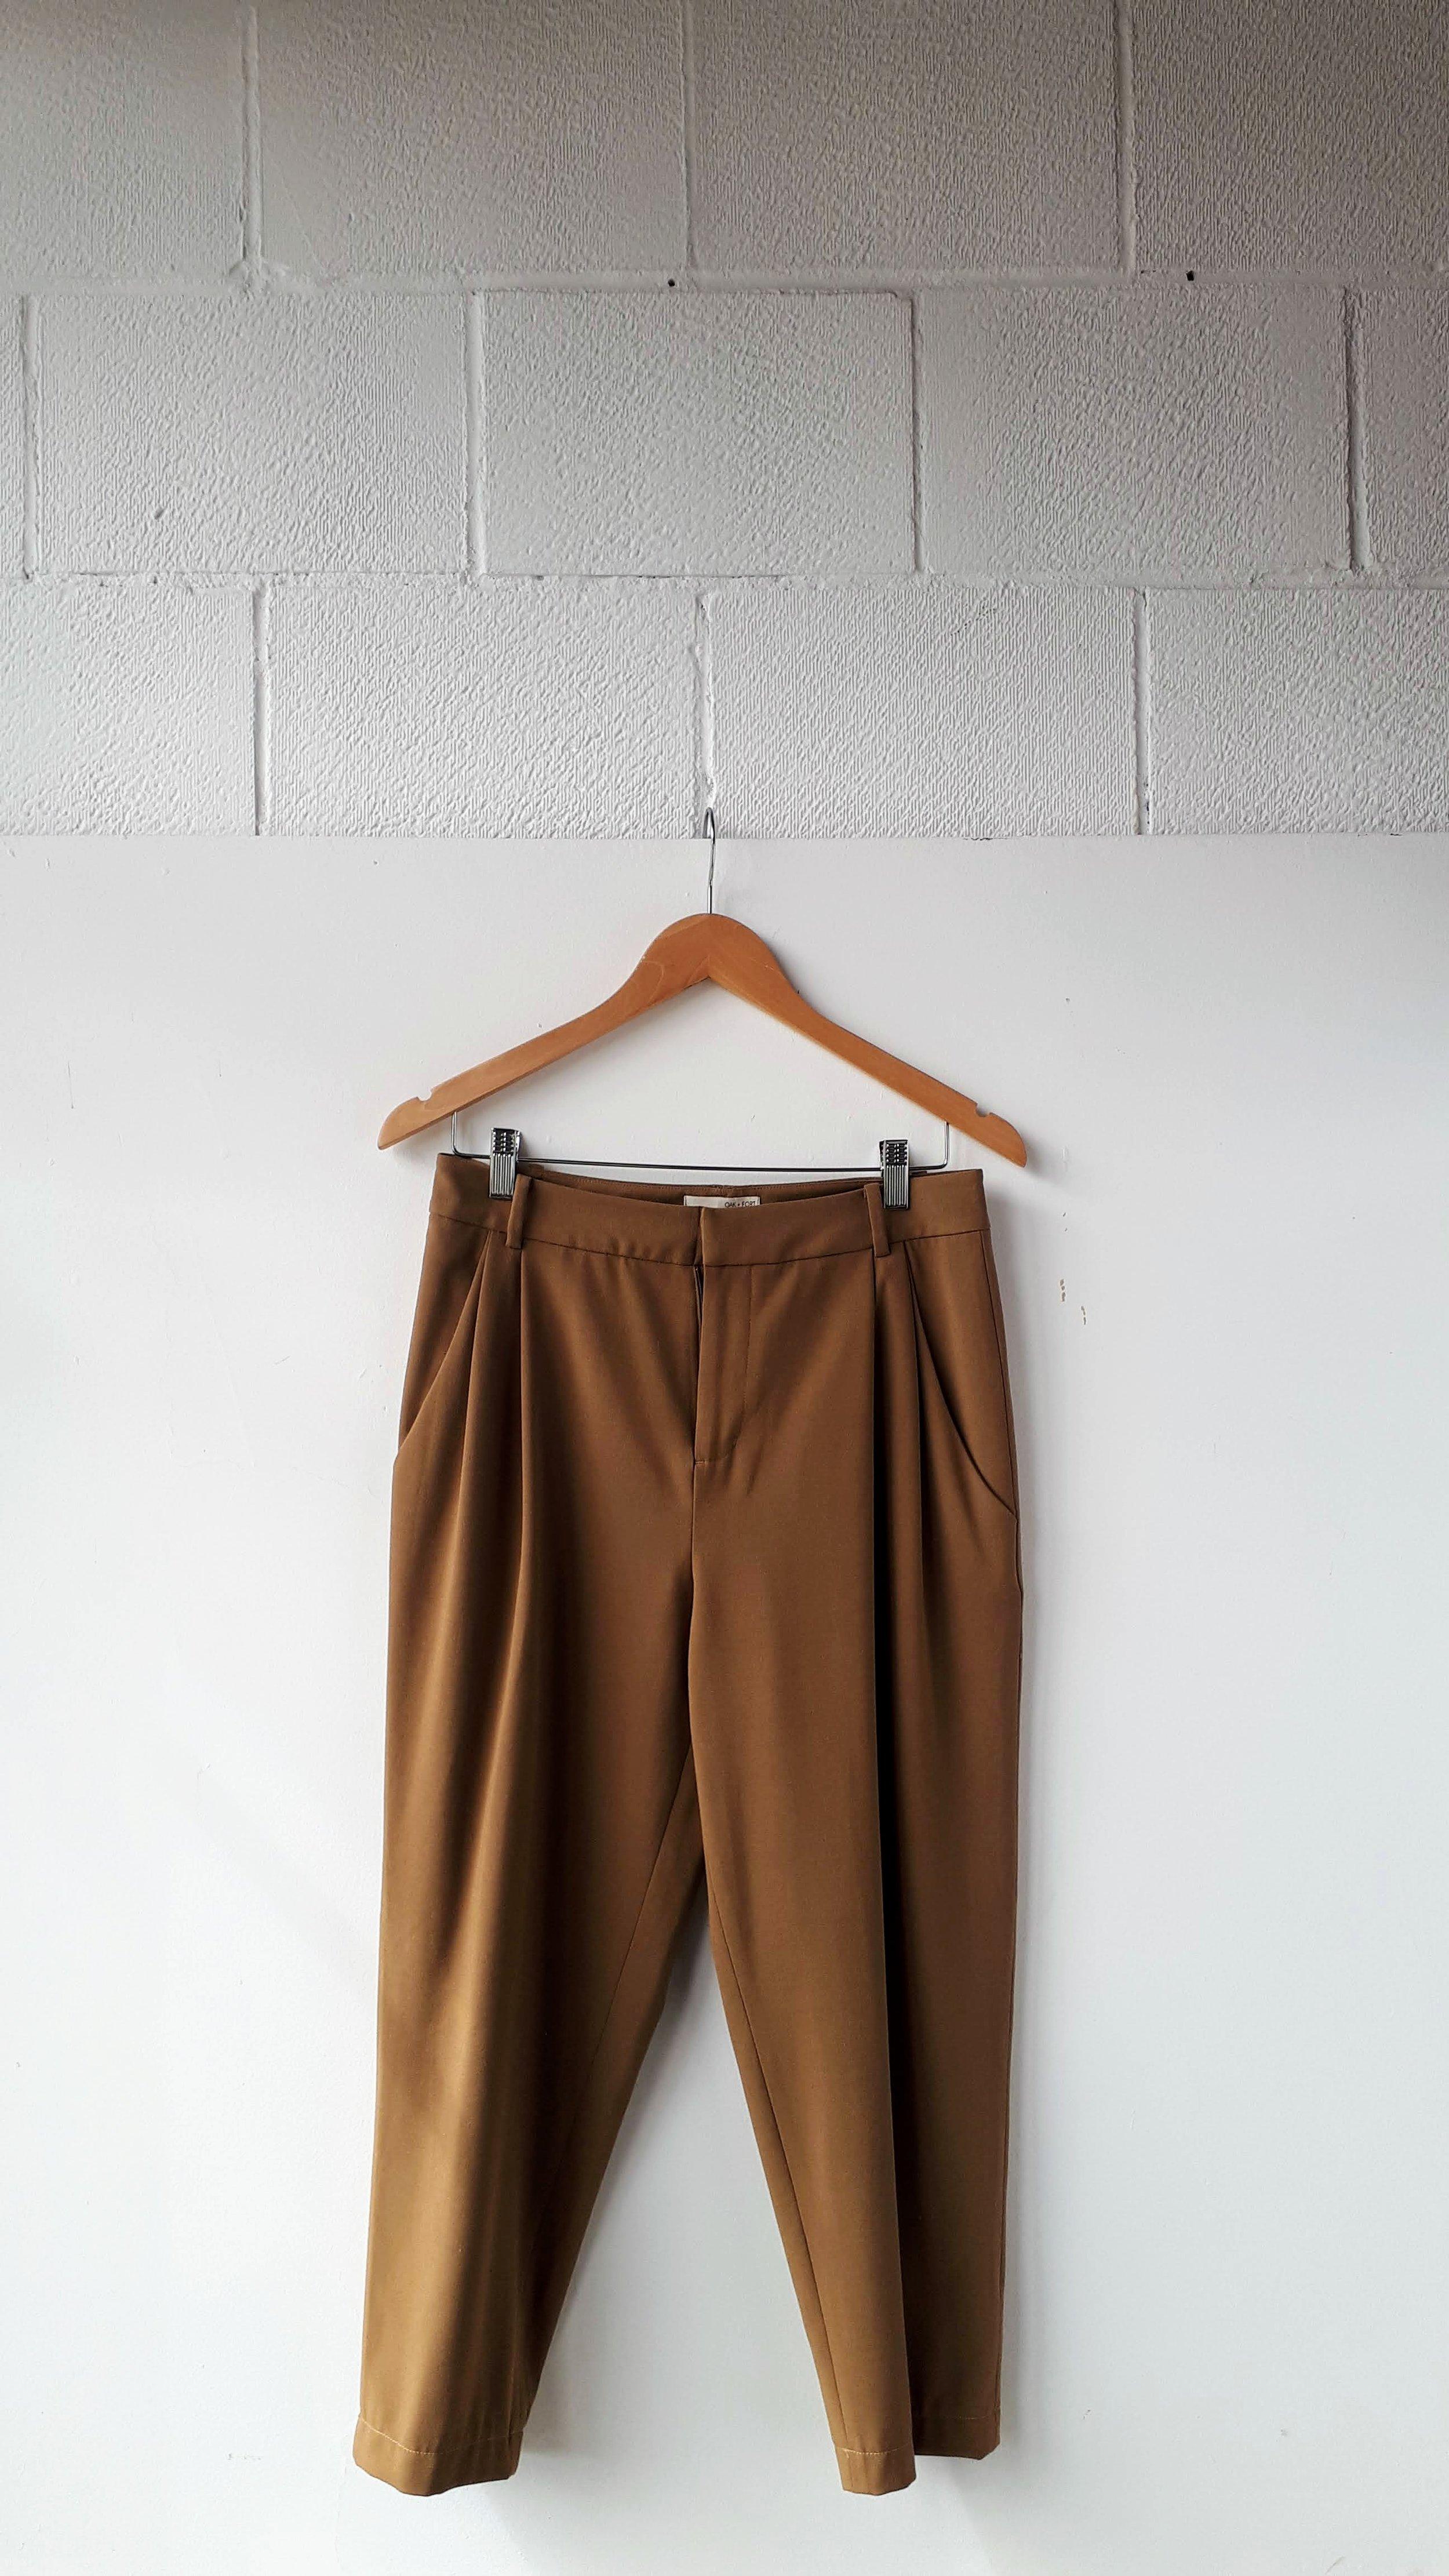 Oak + Fort pants; Size S. $38